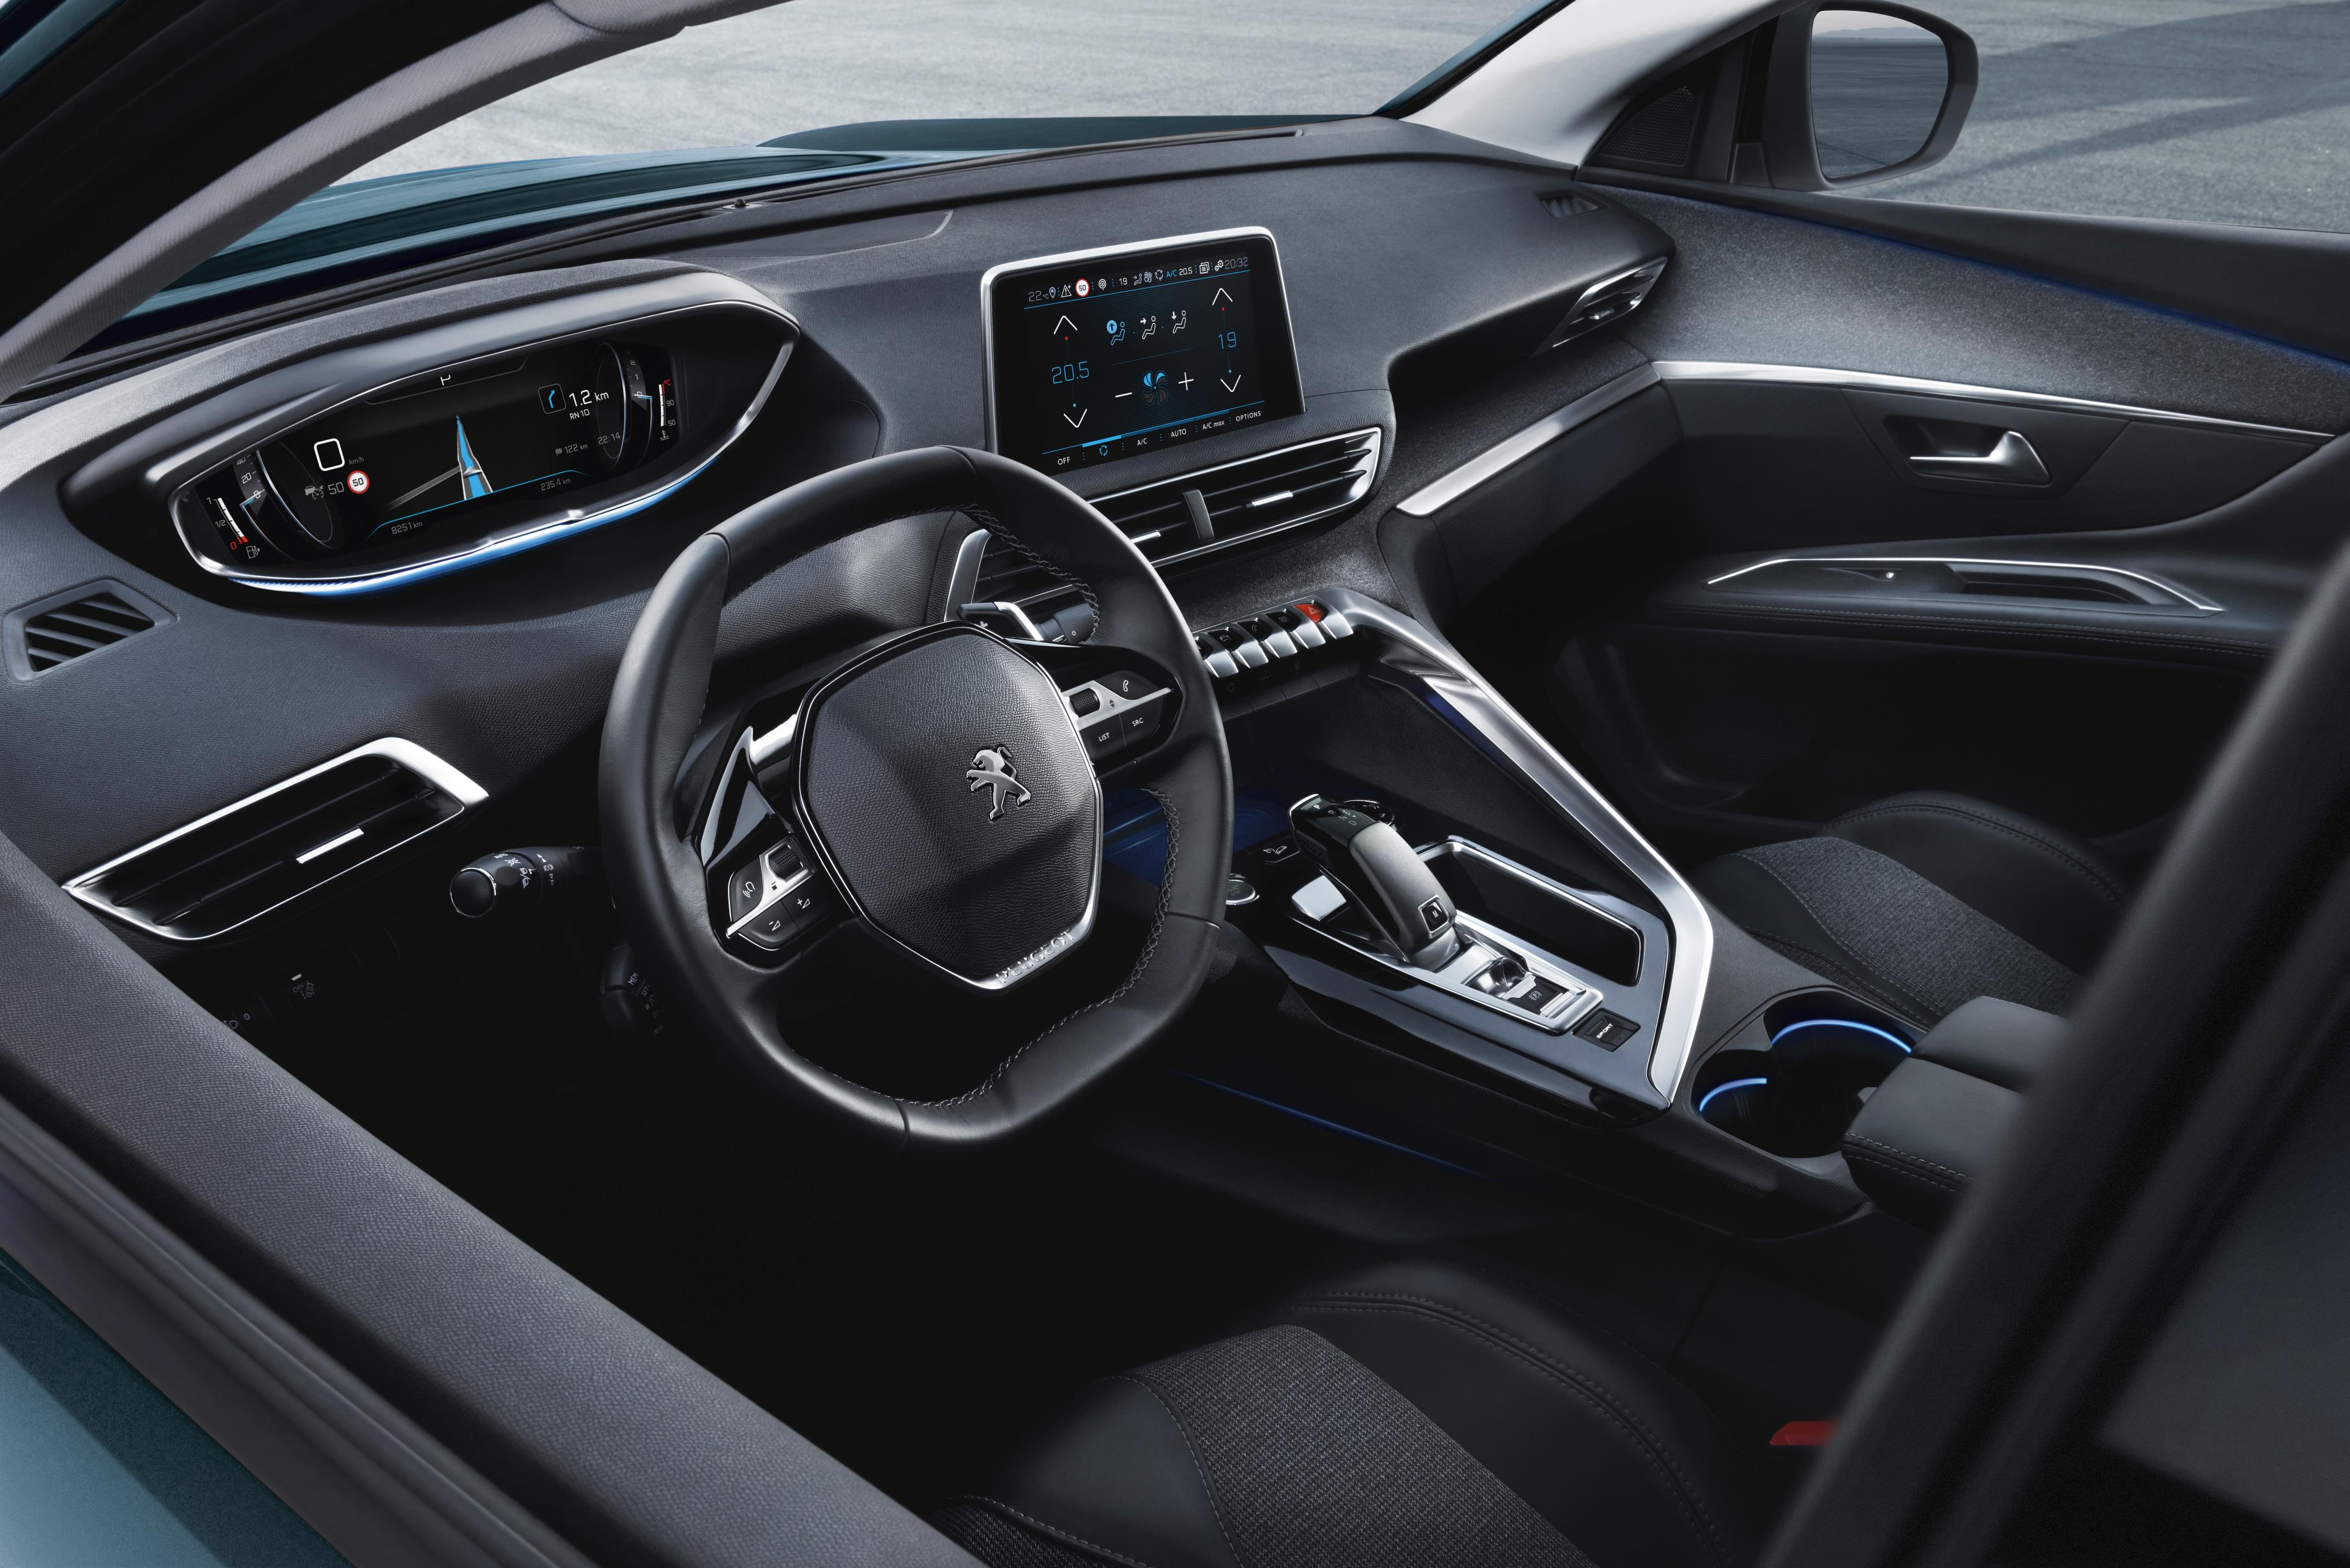 peugeot_5008_2017_interior.jpg